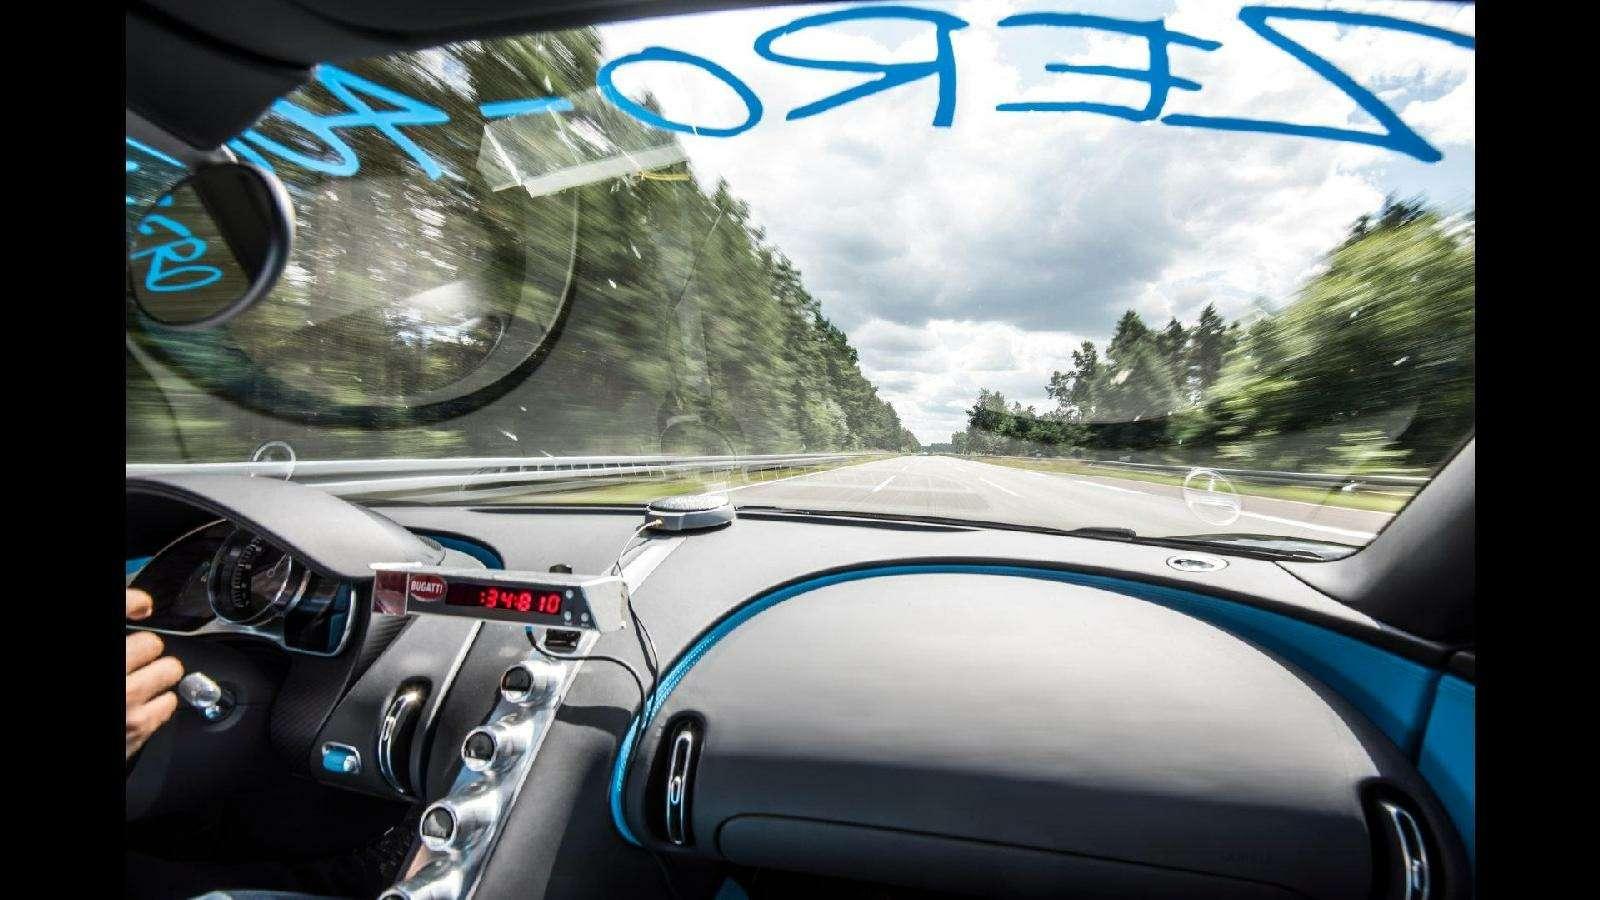 0-400-0 км/ч— видео рекордного заезда Bugatti Chiron— фото 794900